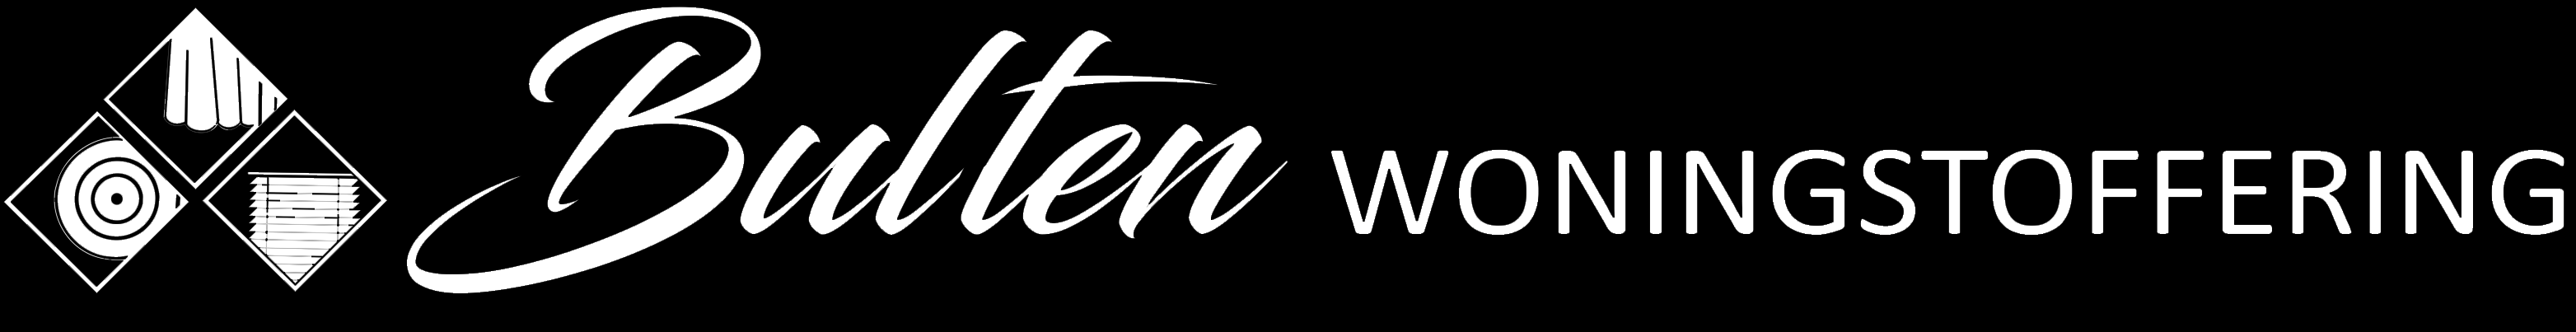 Bulten woningstoffering logo